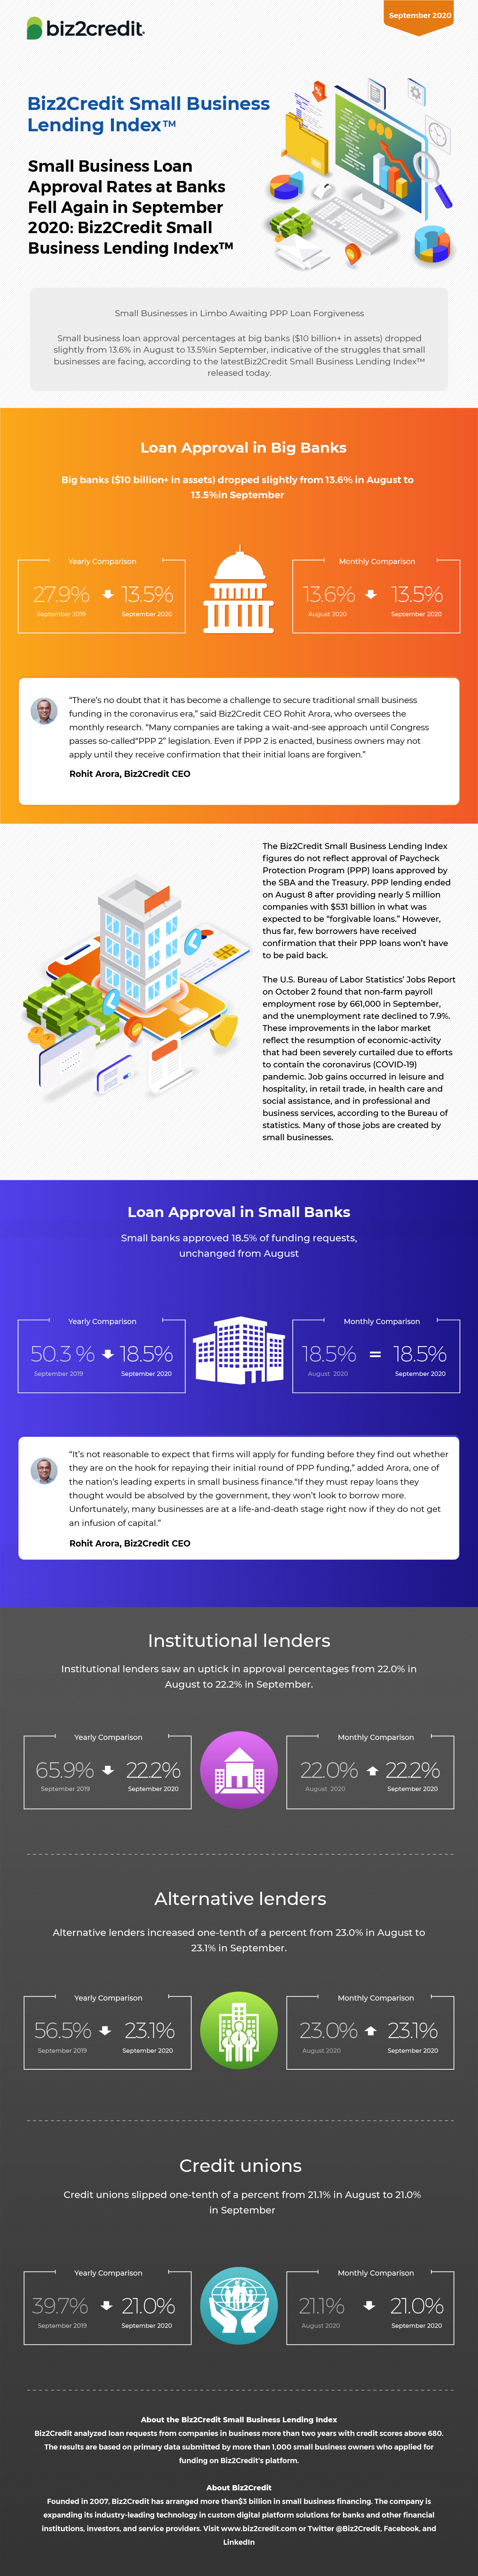 Septembert 2020 Lending Index Infographic